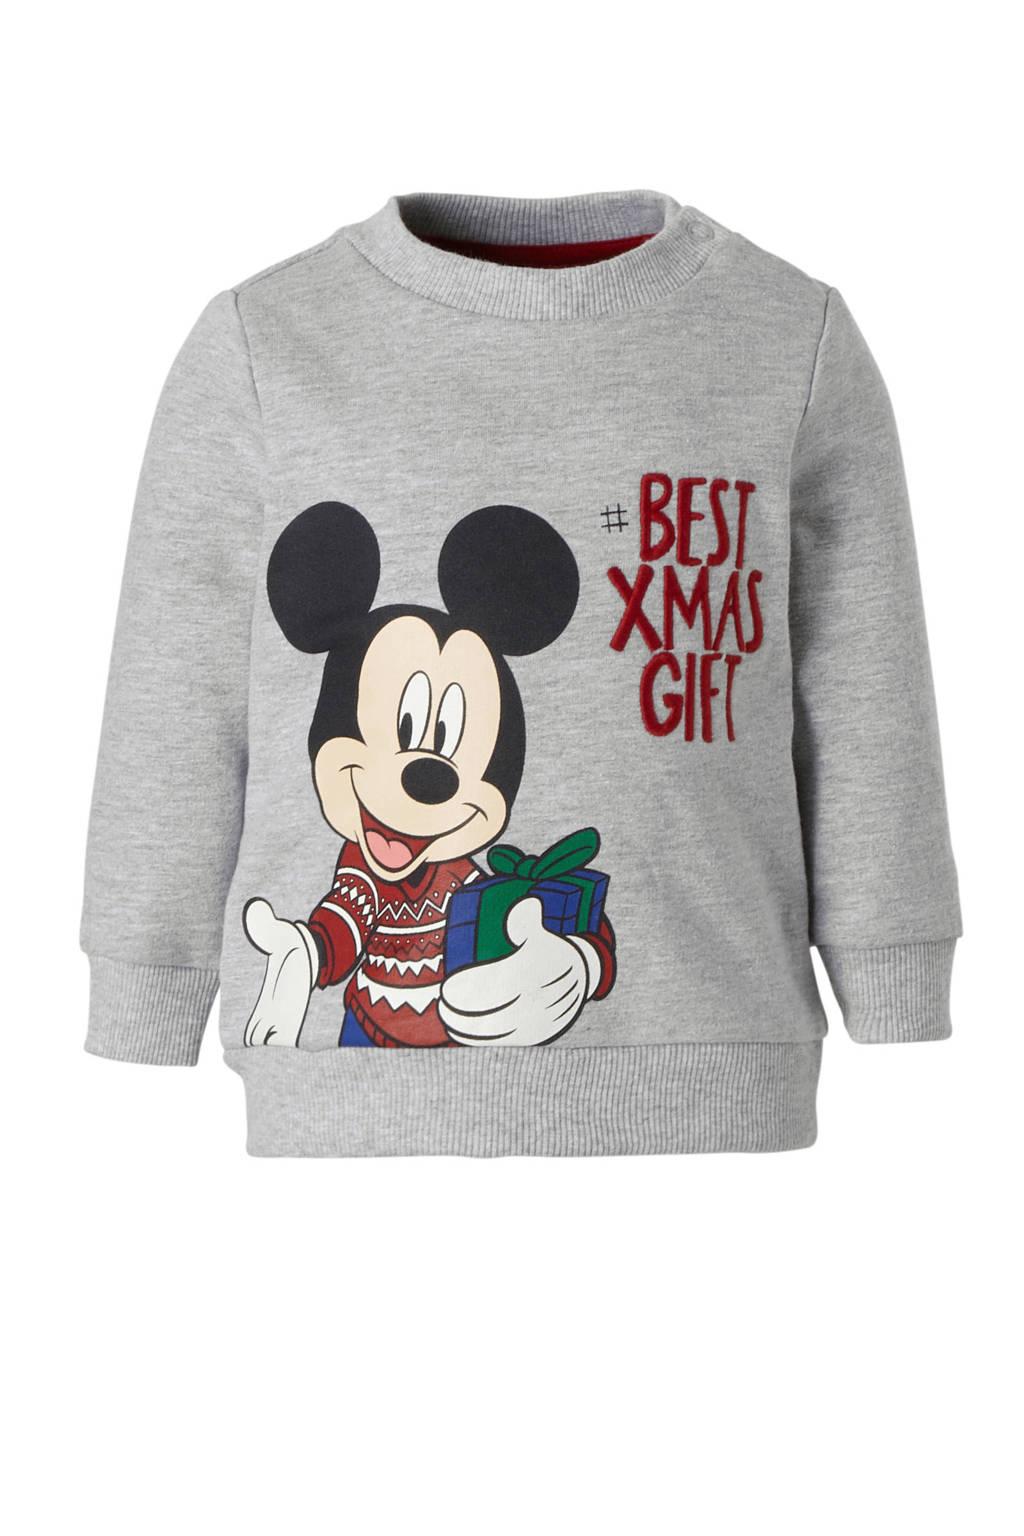 C&A Baby Club Mickey Mouse kersttrui grijs, Grijs melange